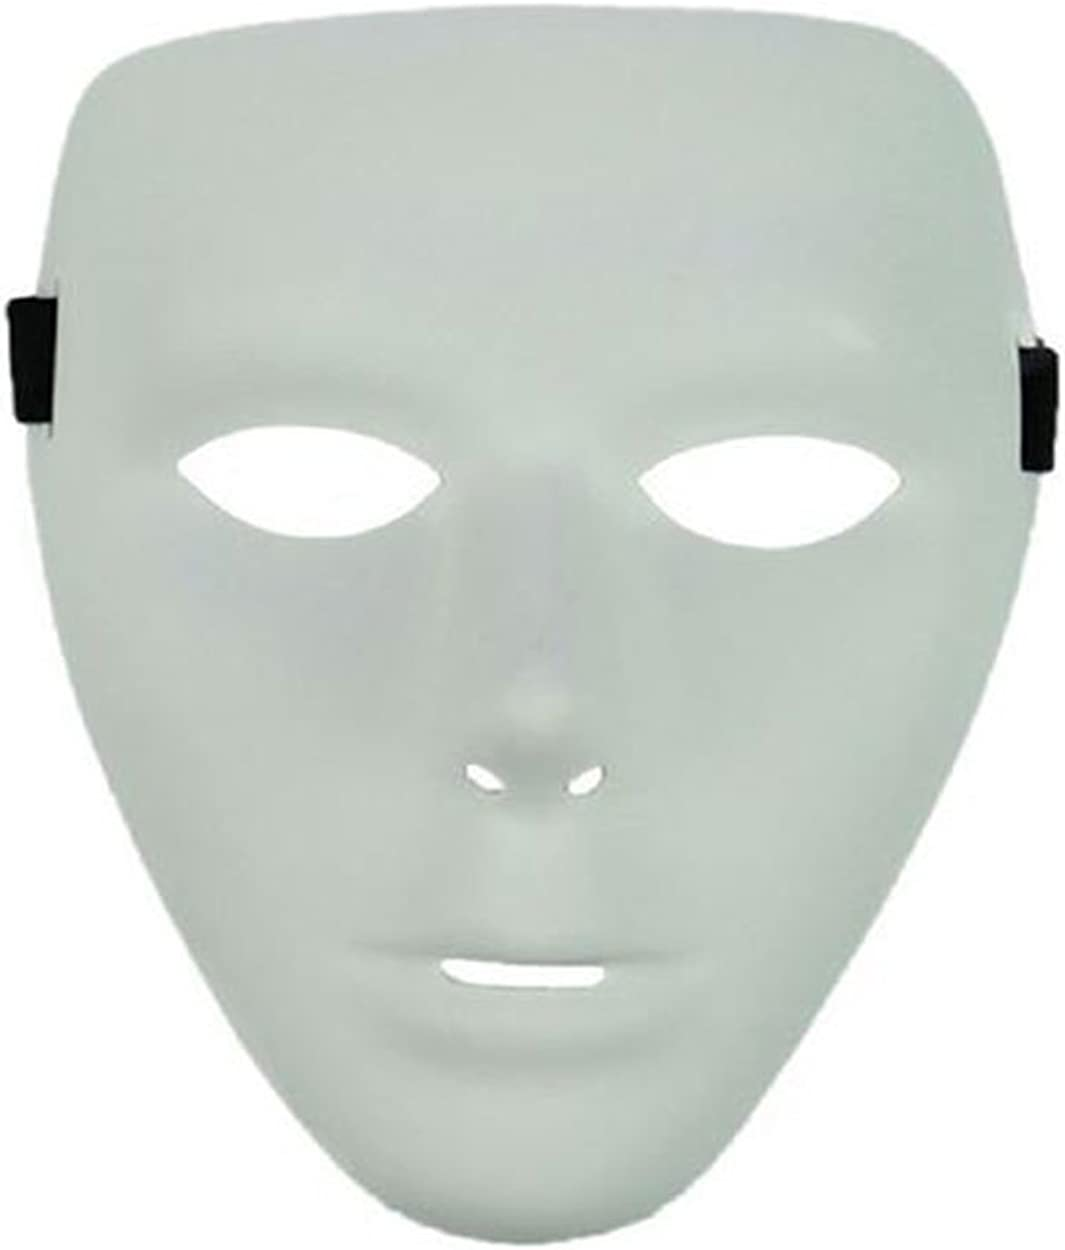 White, 3-Pack EmazingLights Dance Mask 2.0